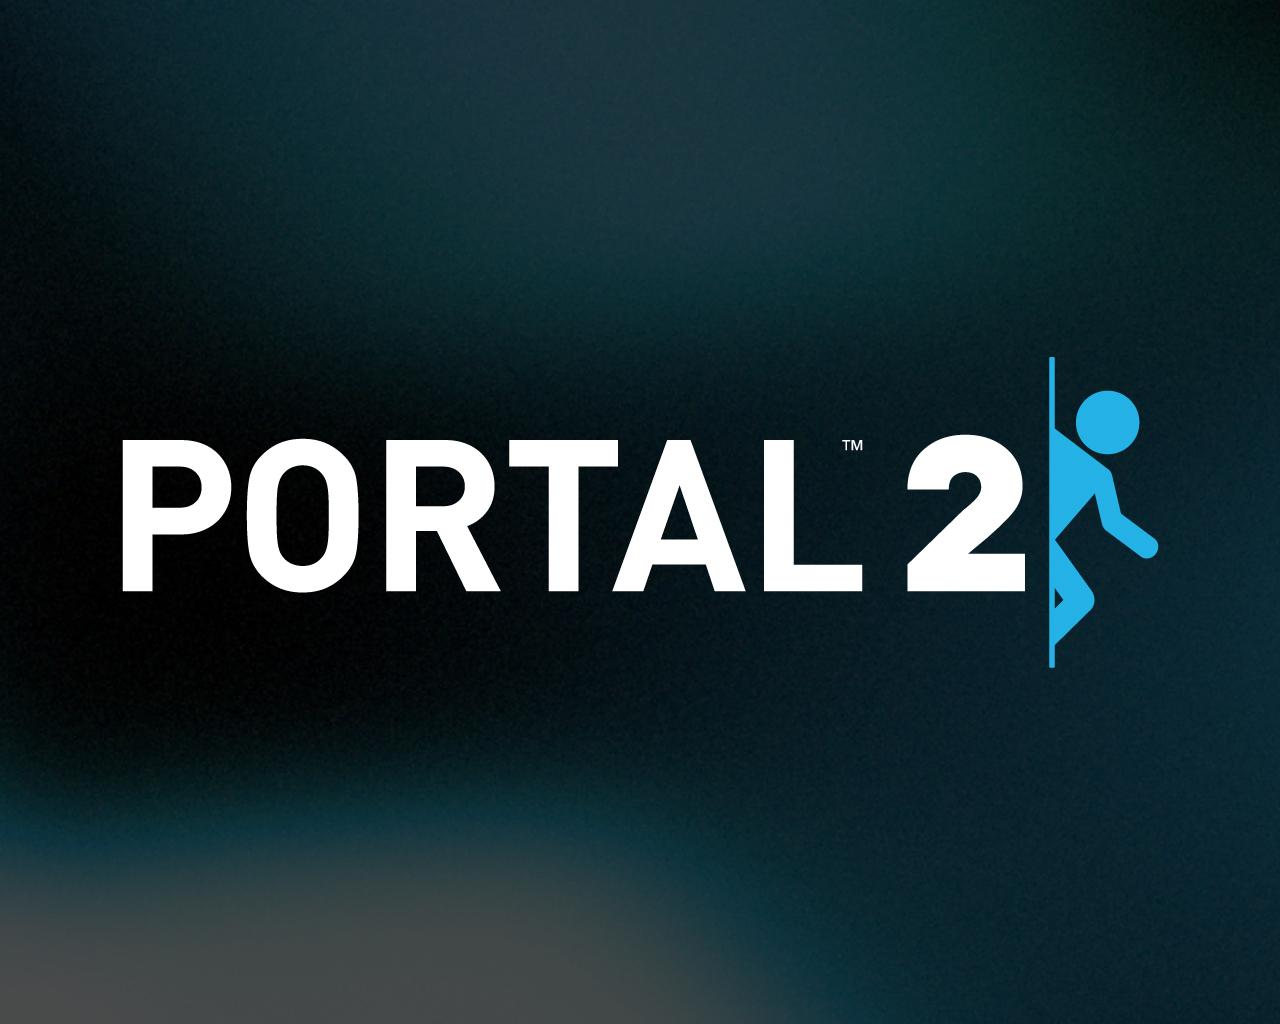 Portal forum